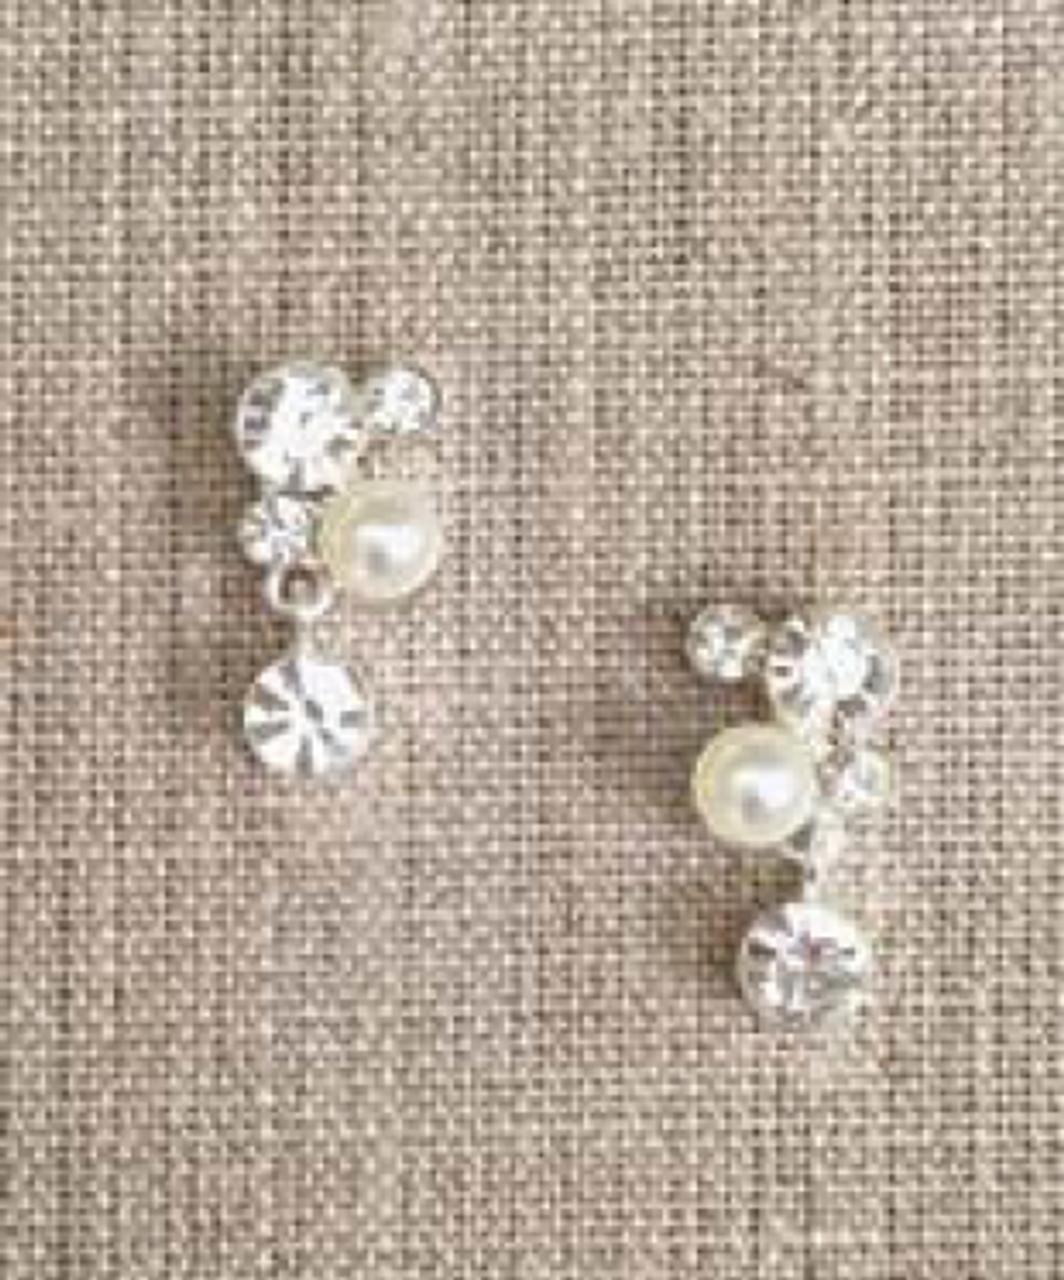 Bel Aire Bridal Earrings EA265 - Rhinestone drop earrings